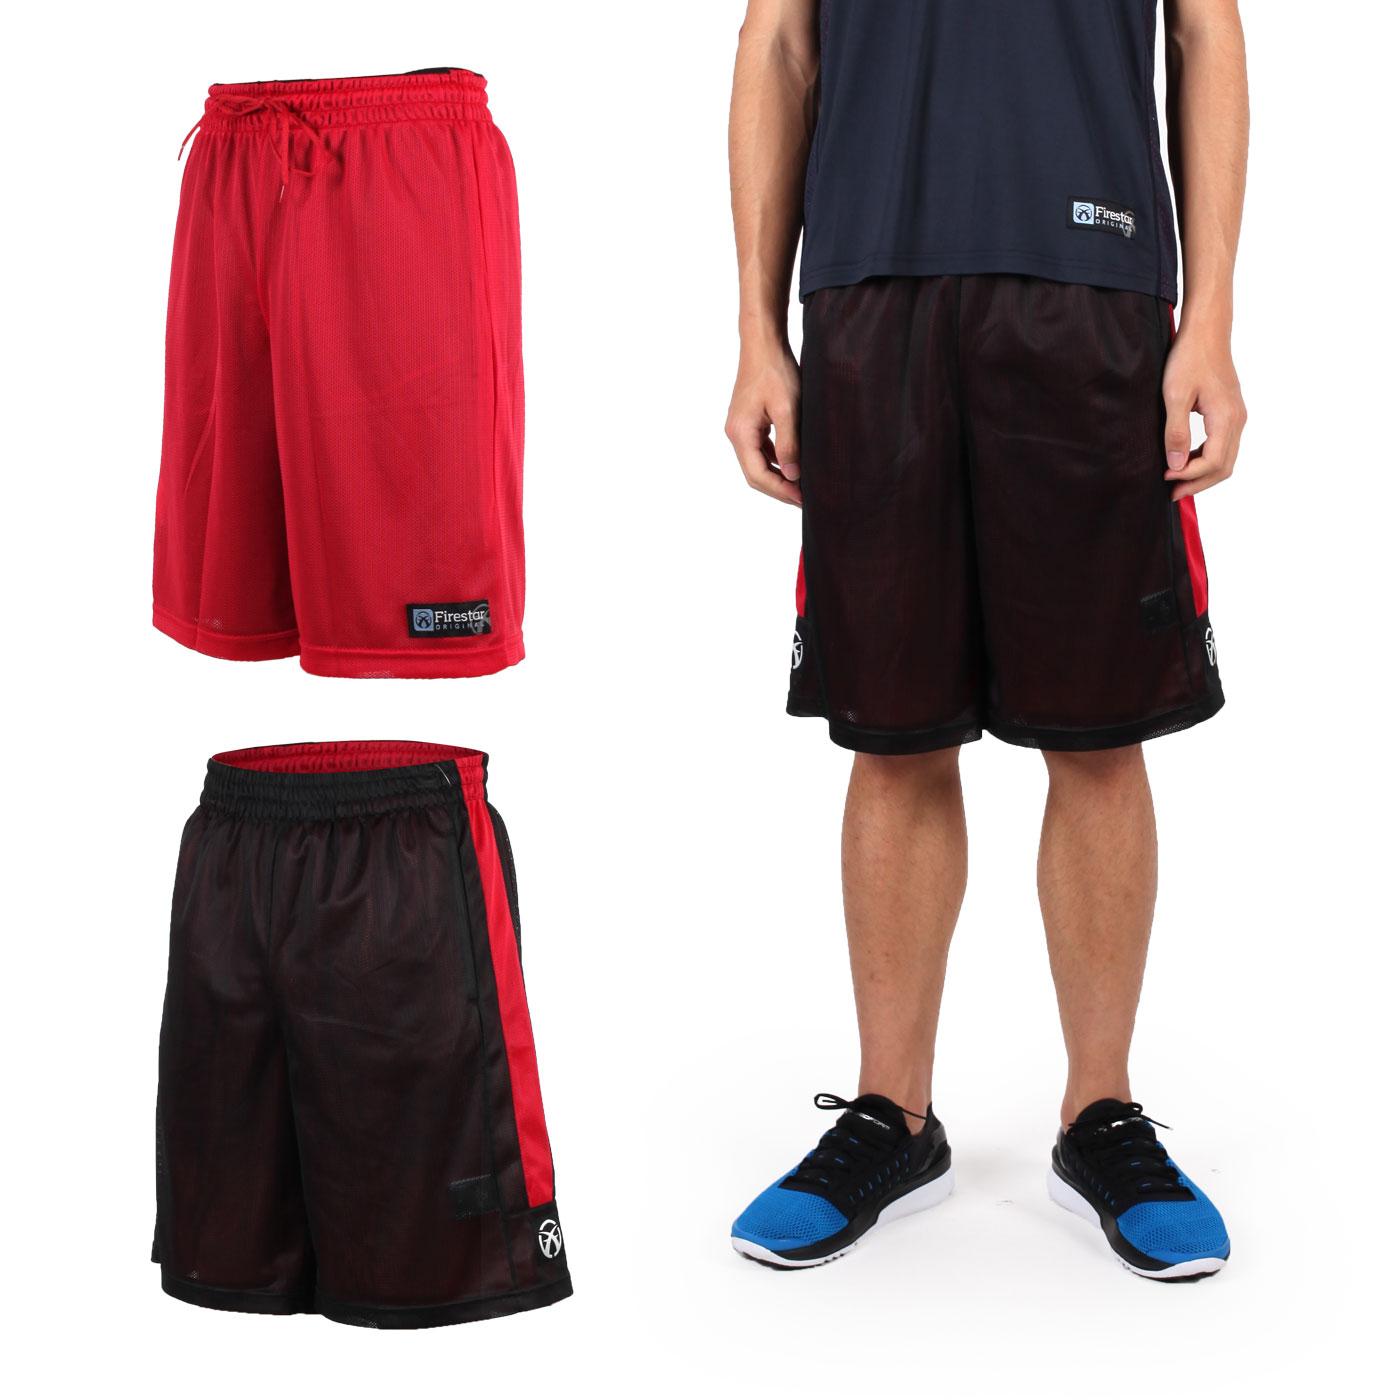 FIRESTAR 男雙面網布籃球褲 B6306-10 - 黑紅